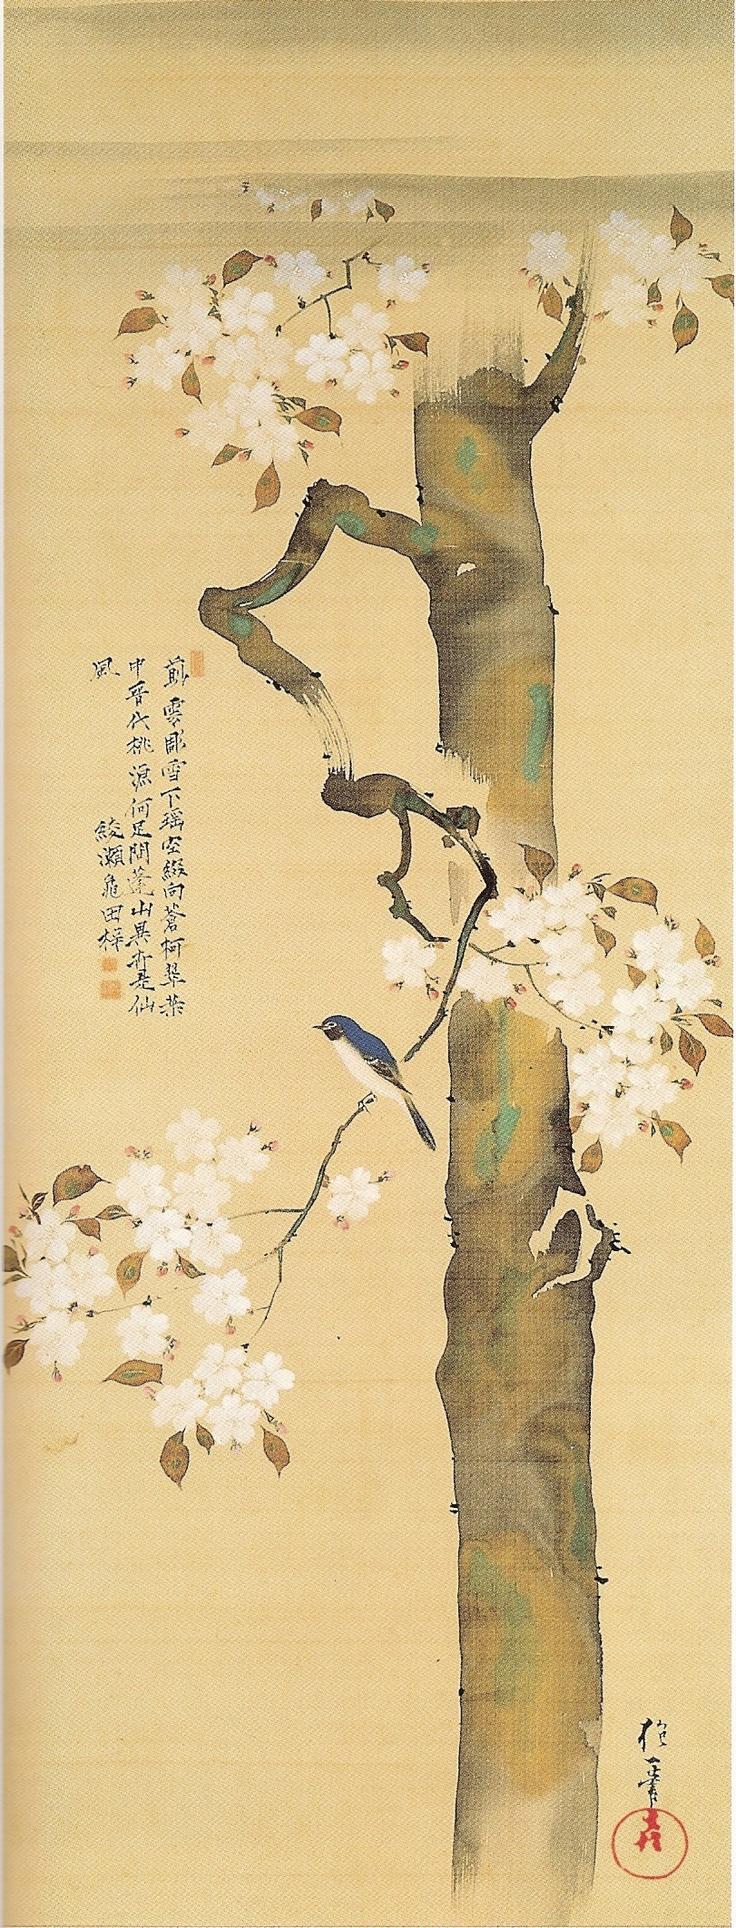 SAKAI, Hoitsu http://en.wikipedia.org/wiki/Sakai_H%C5%8Ditsu